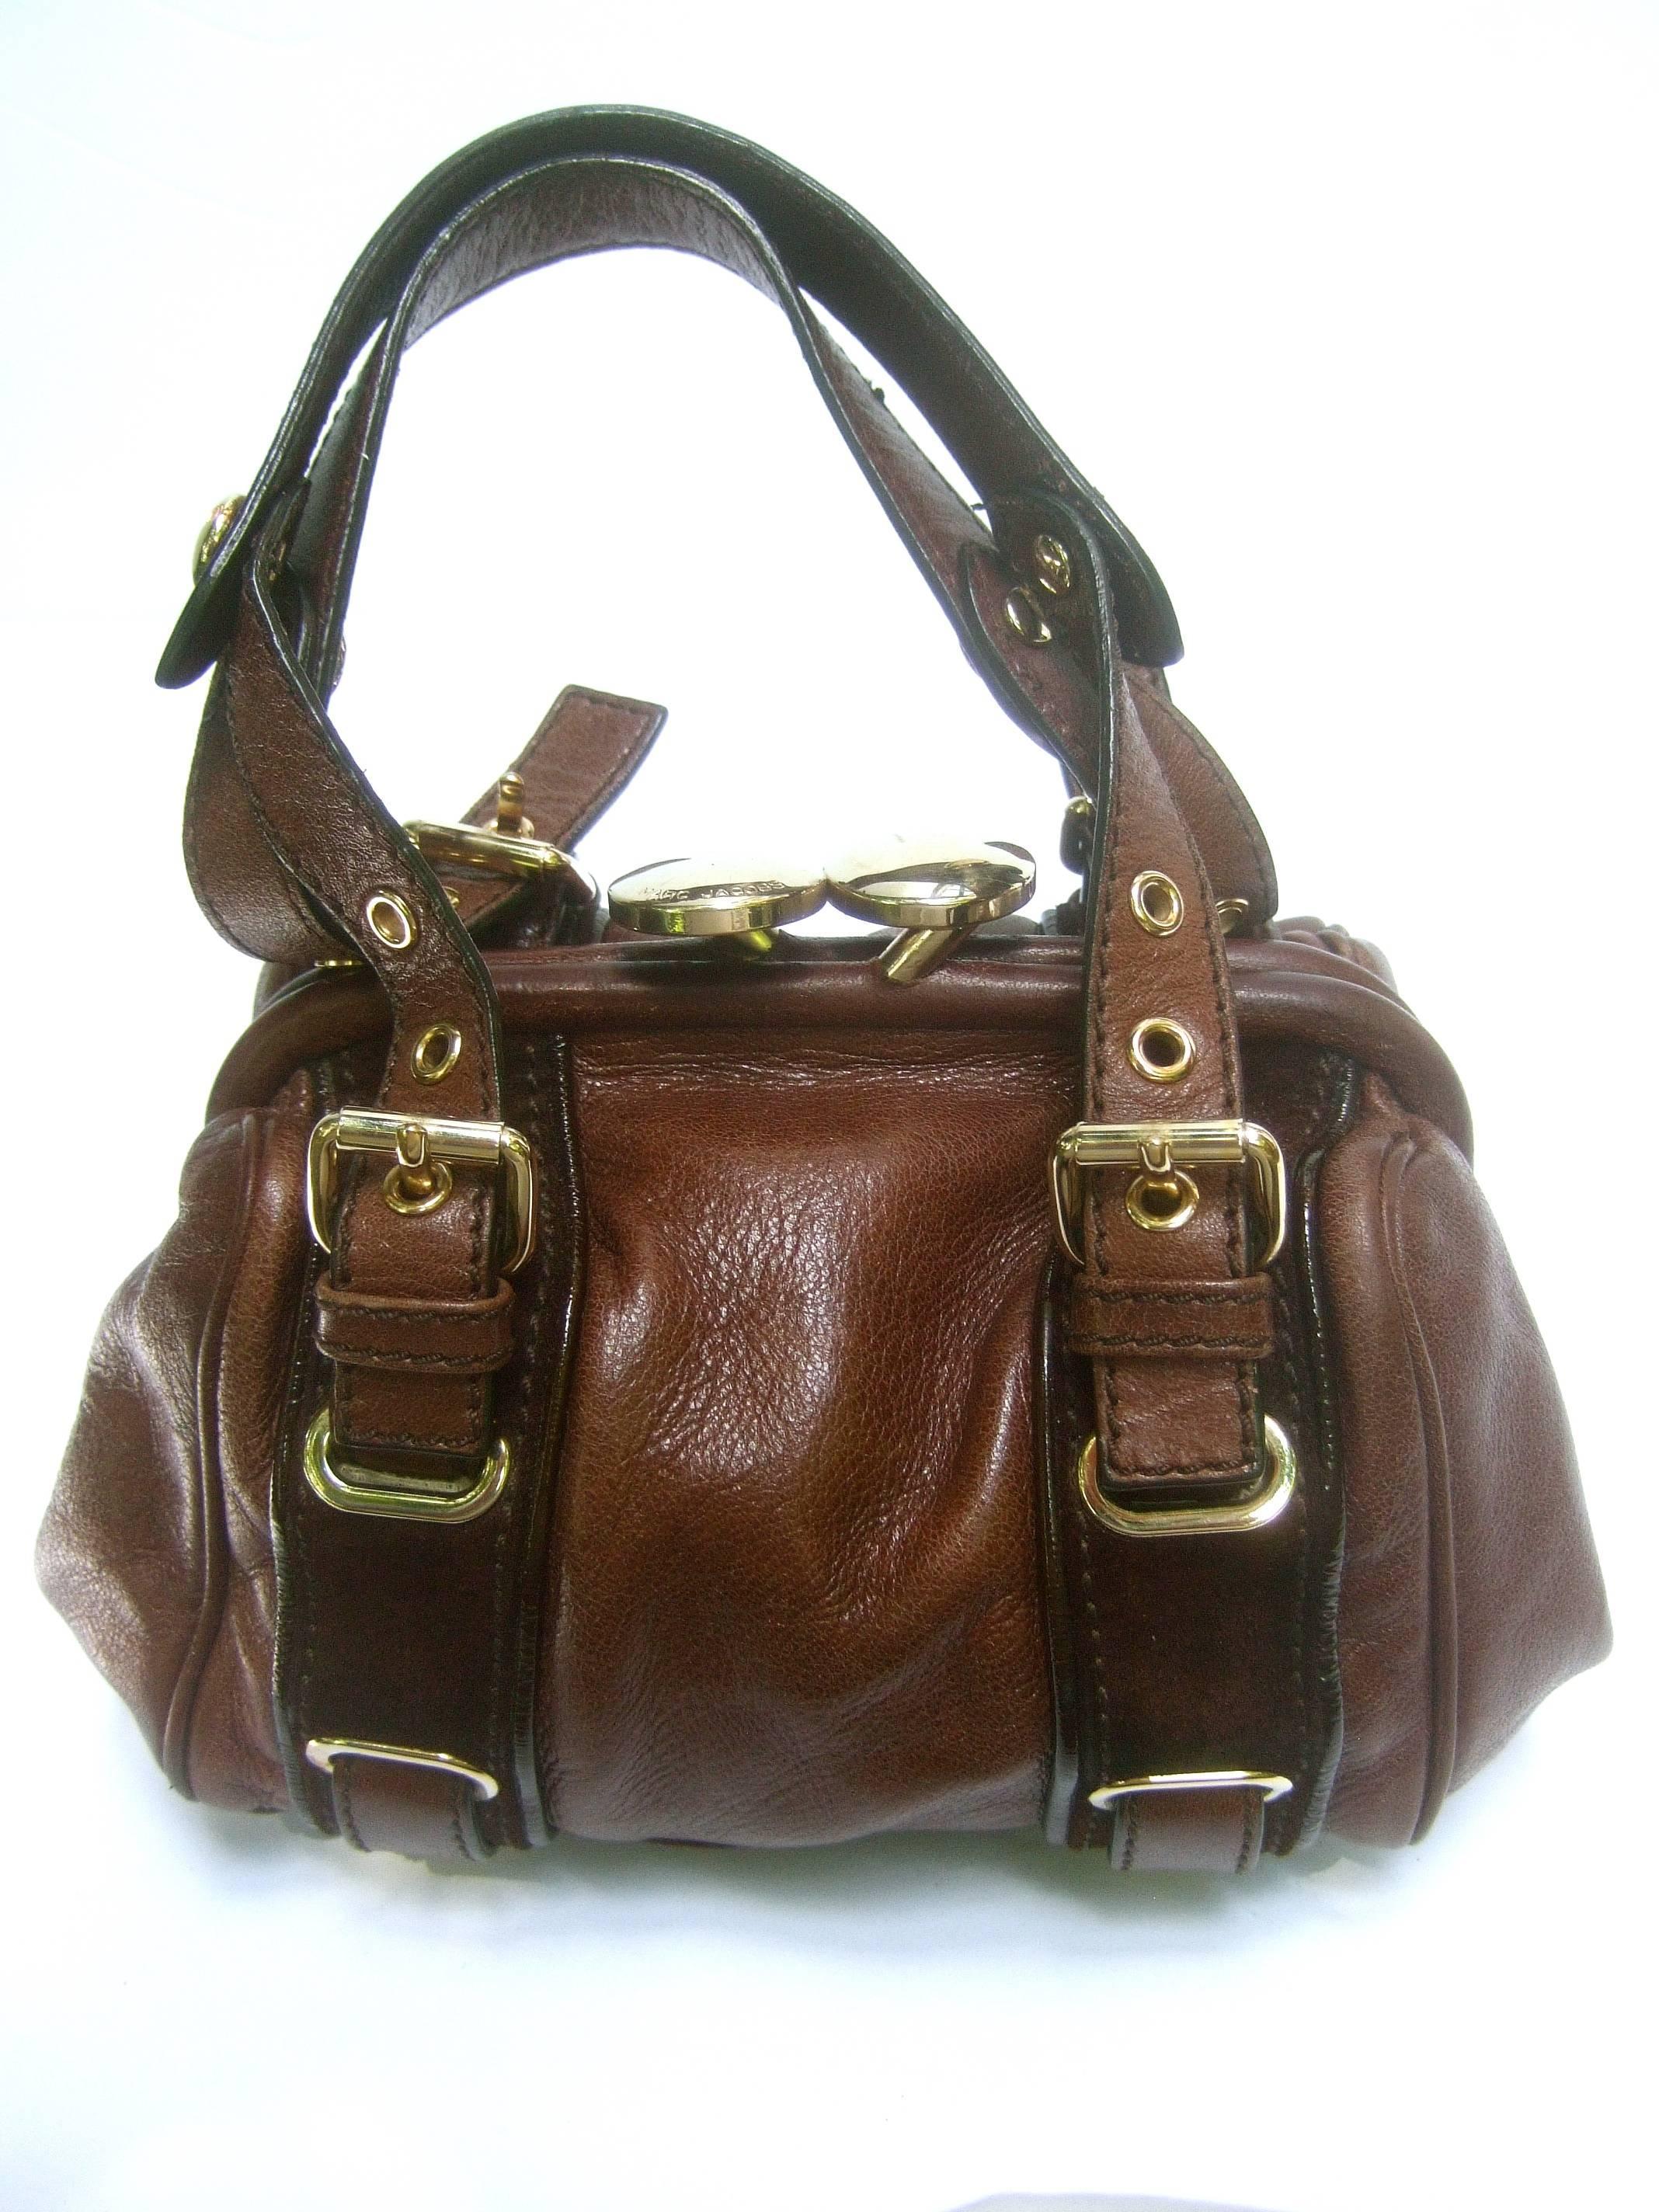 440c33466a8d Marc Jacobs Italian Brown Leather Diminutive Handbag At 1stdibs. Lyst Marc  By Jacobs Clic Q Natasha Crossbody ...